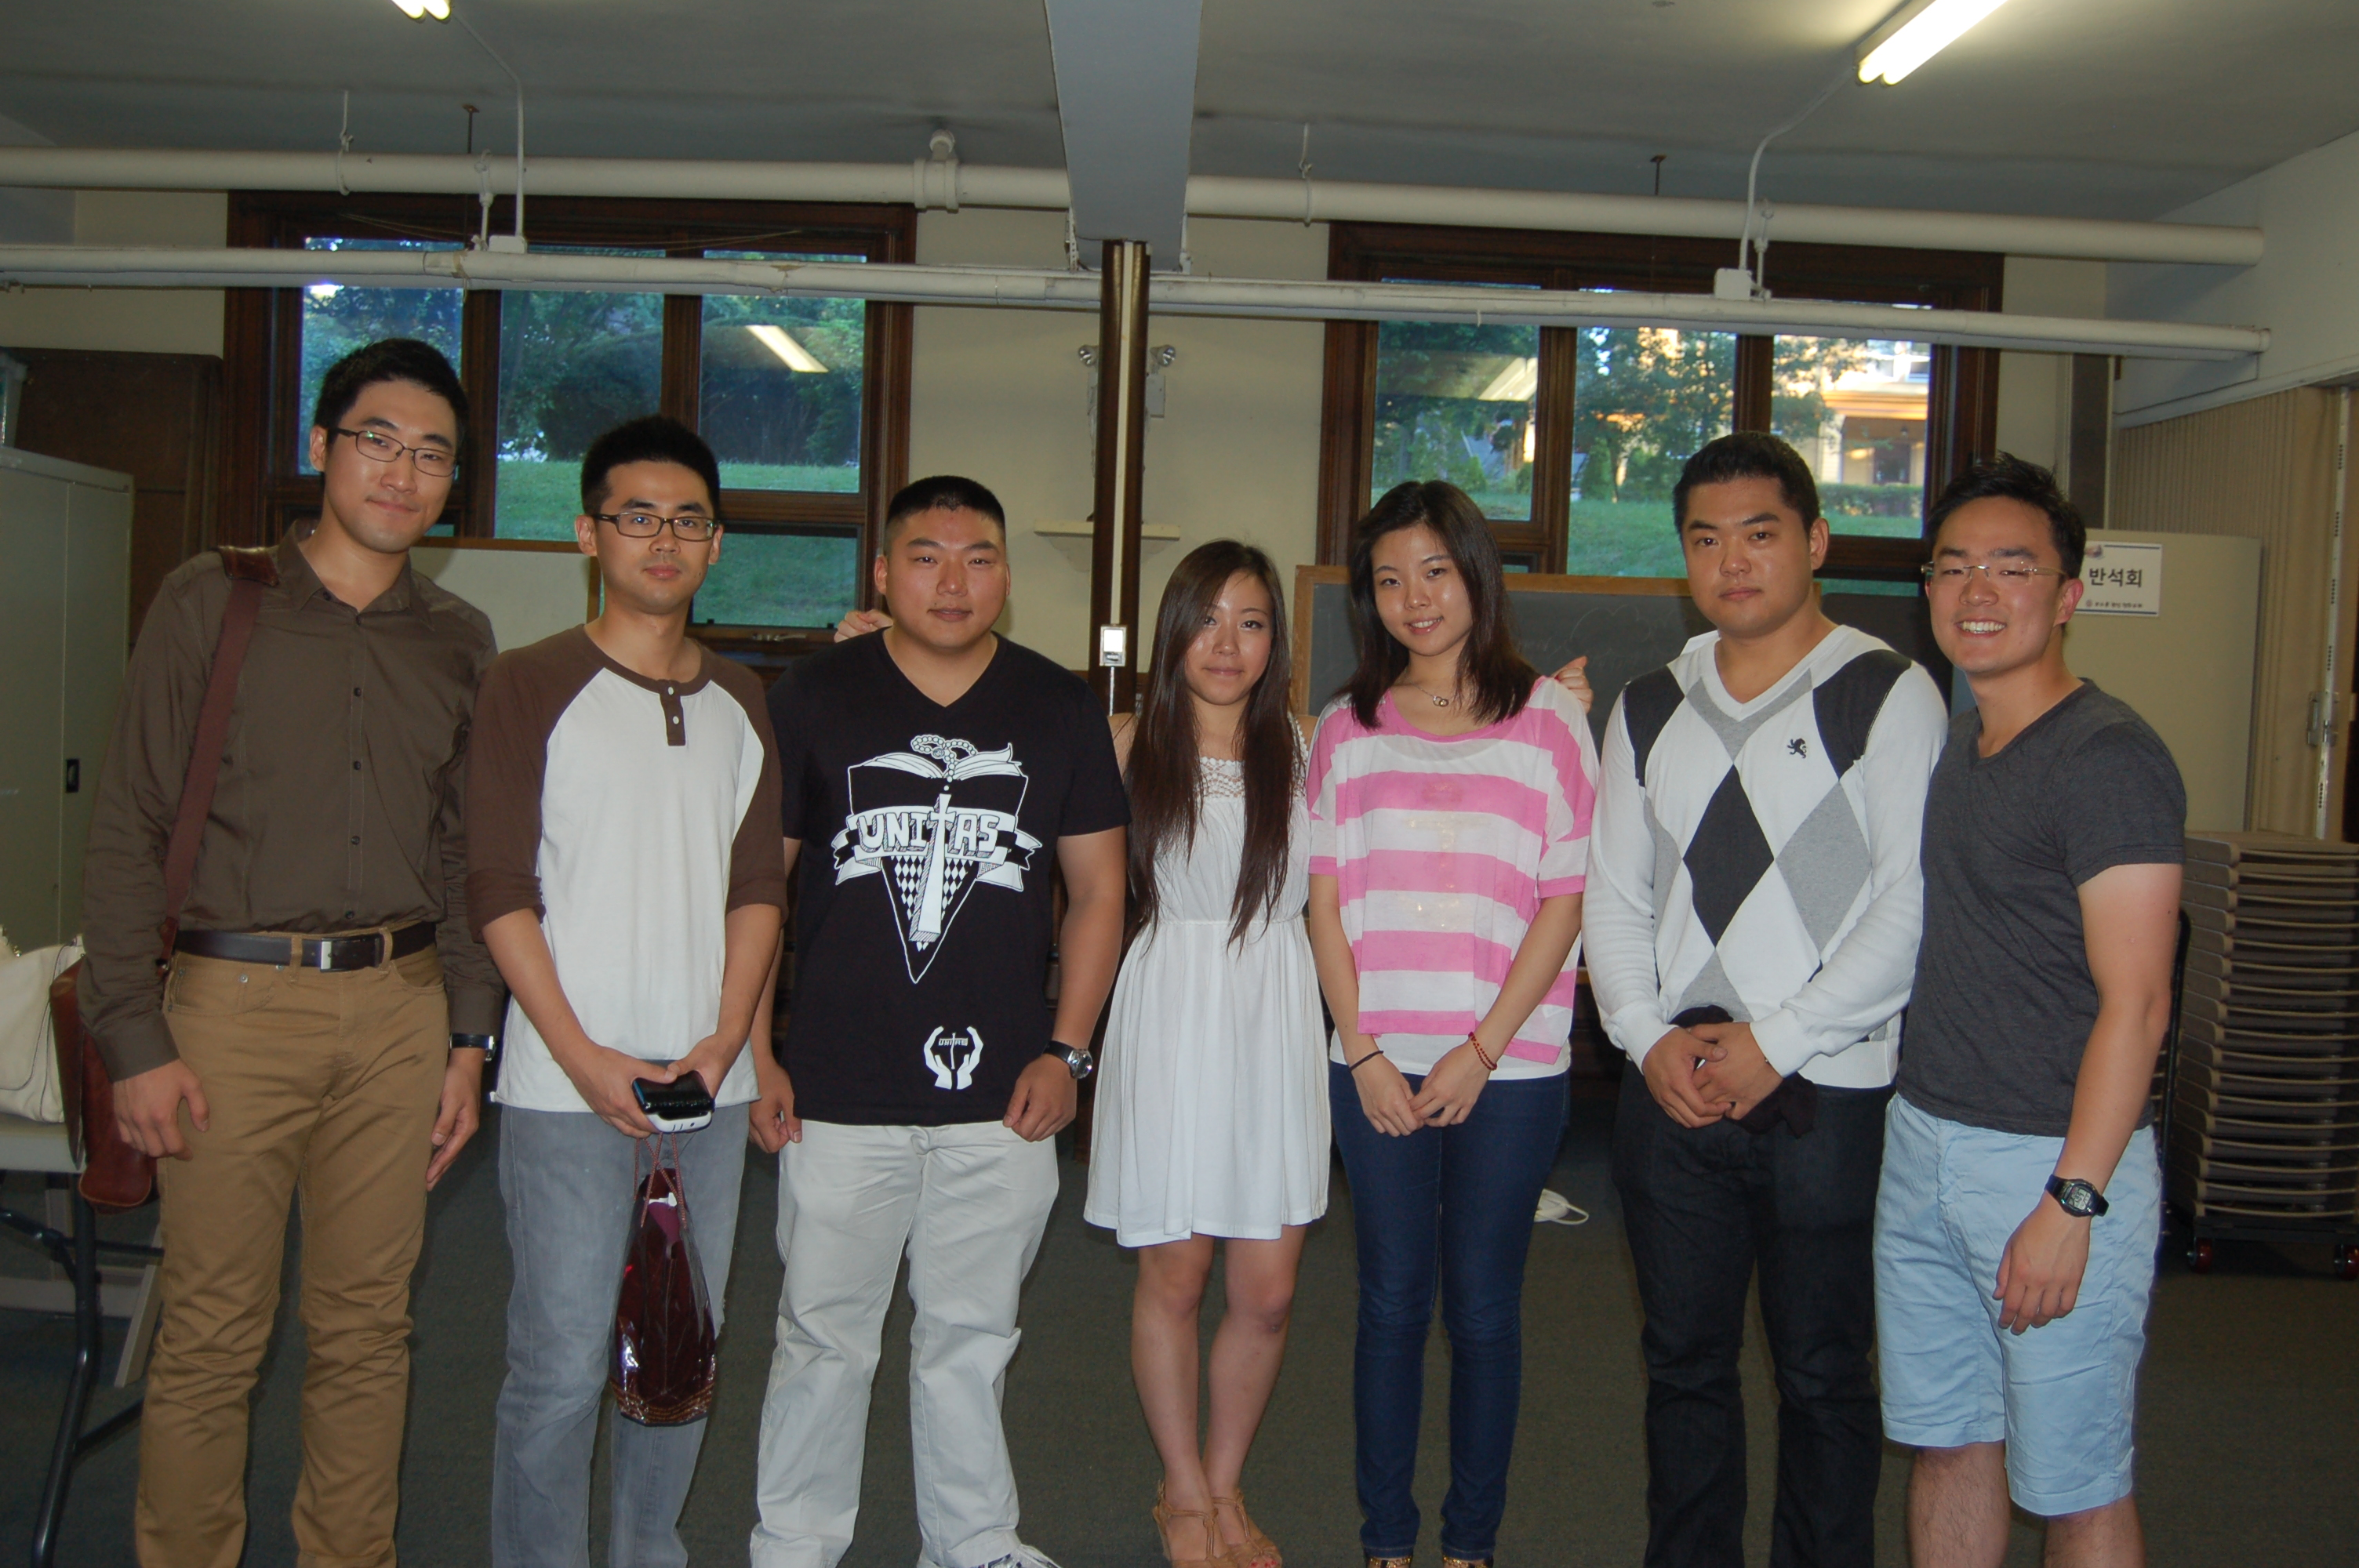 Catholic young adult group